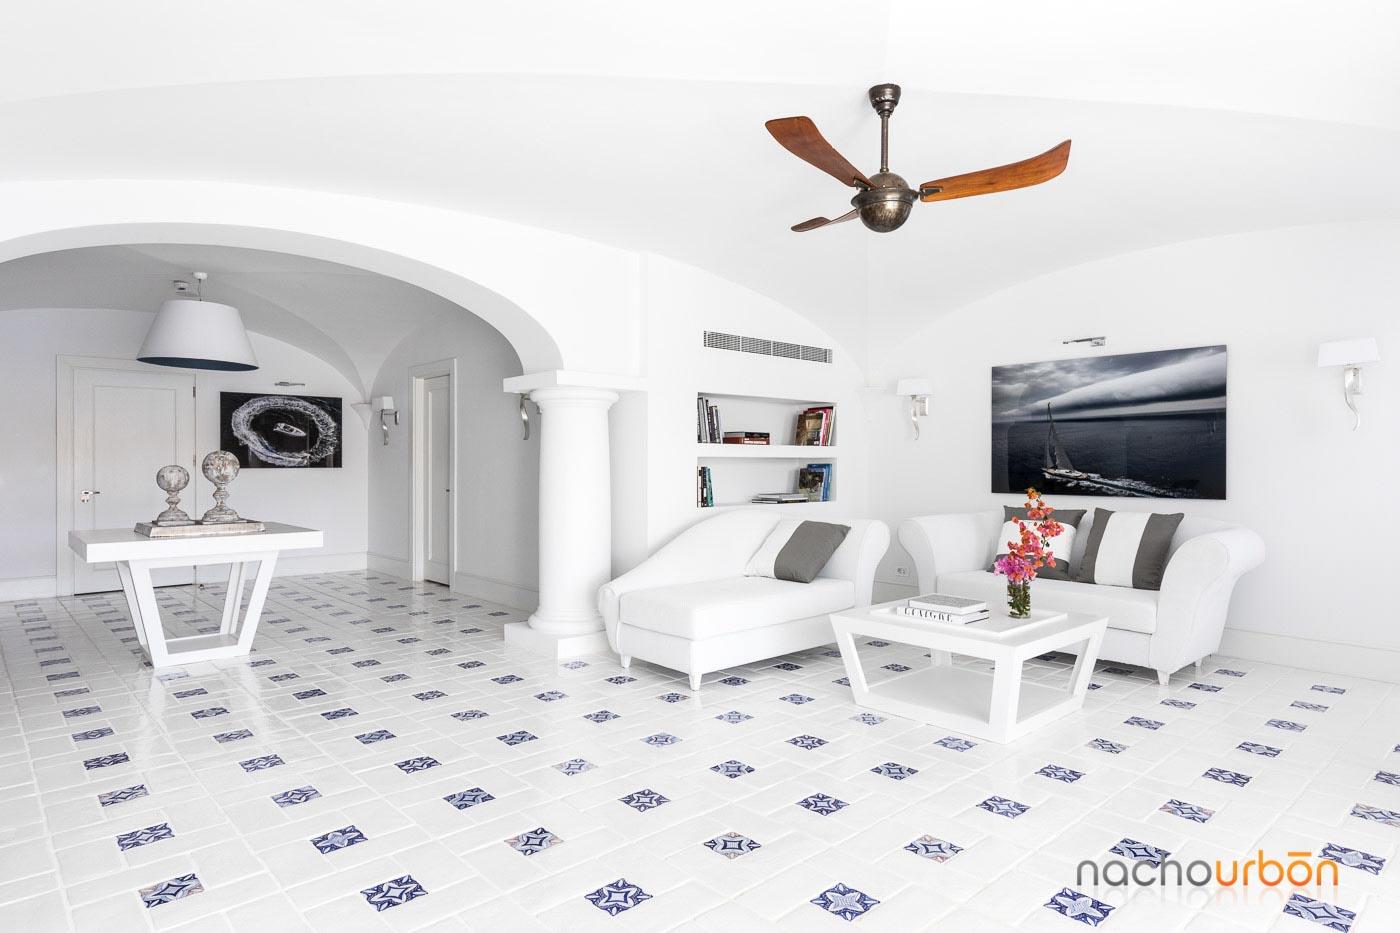 fotografo-hotel-andrew_habeck-nachourbon-profesional